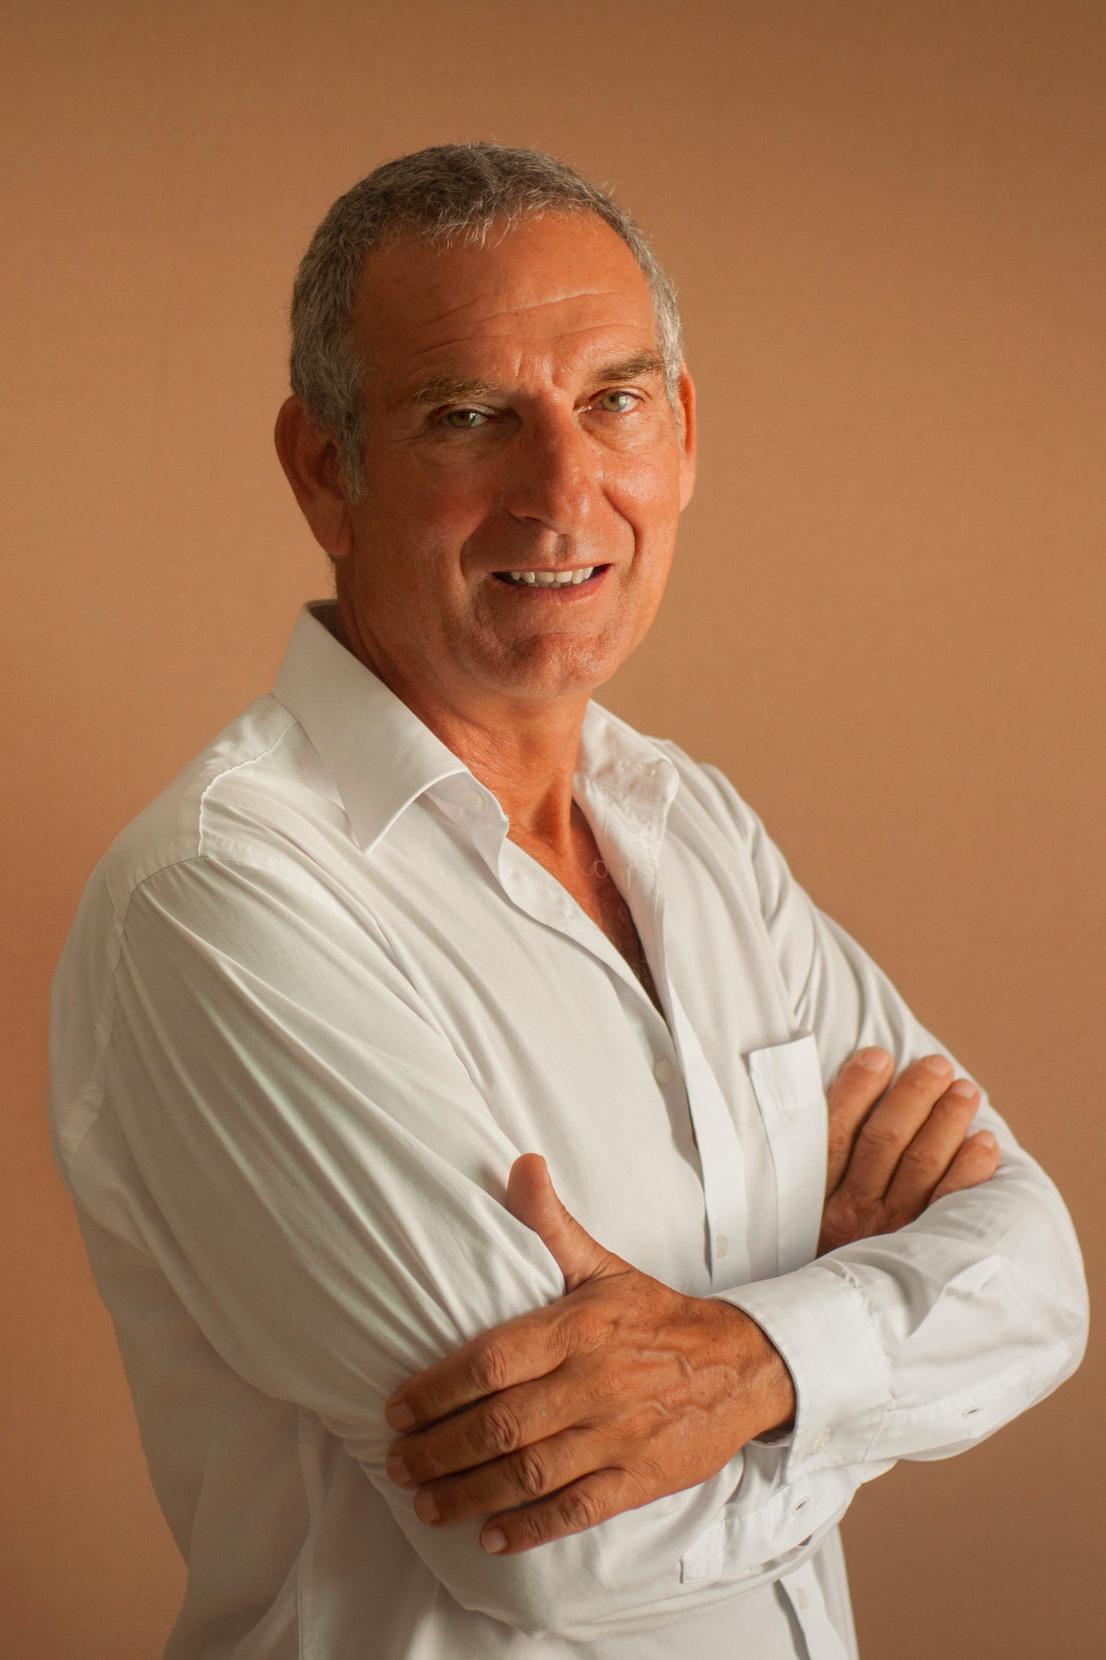 Maurizio Bellazzecca - Asesor InmobiliarioIdiomas: Español / Ingles / Italianomauri@selvacorealty.com